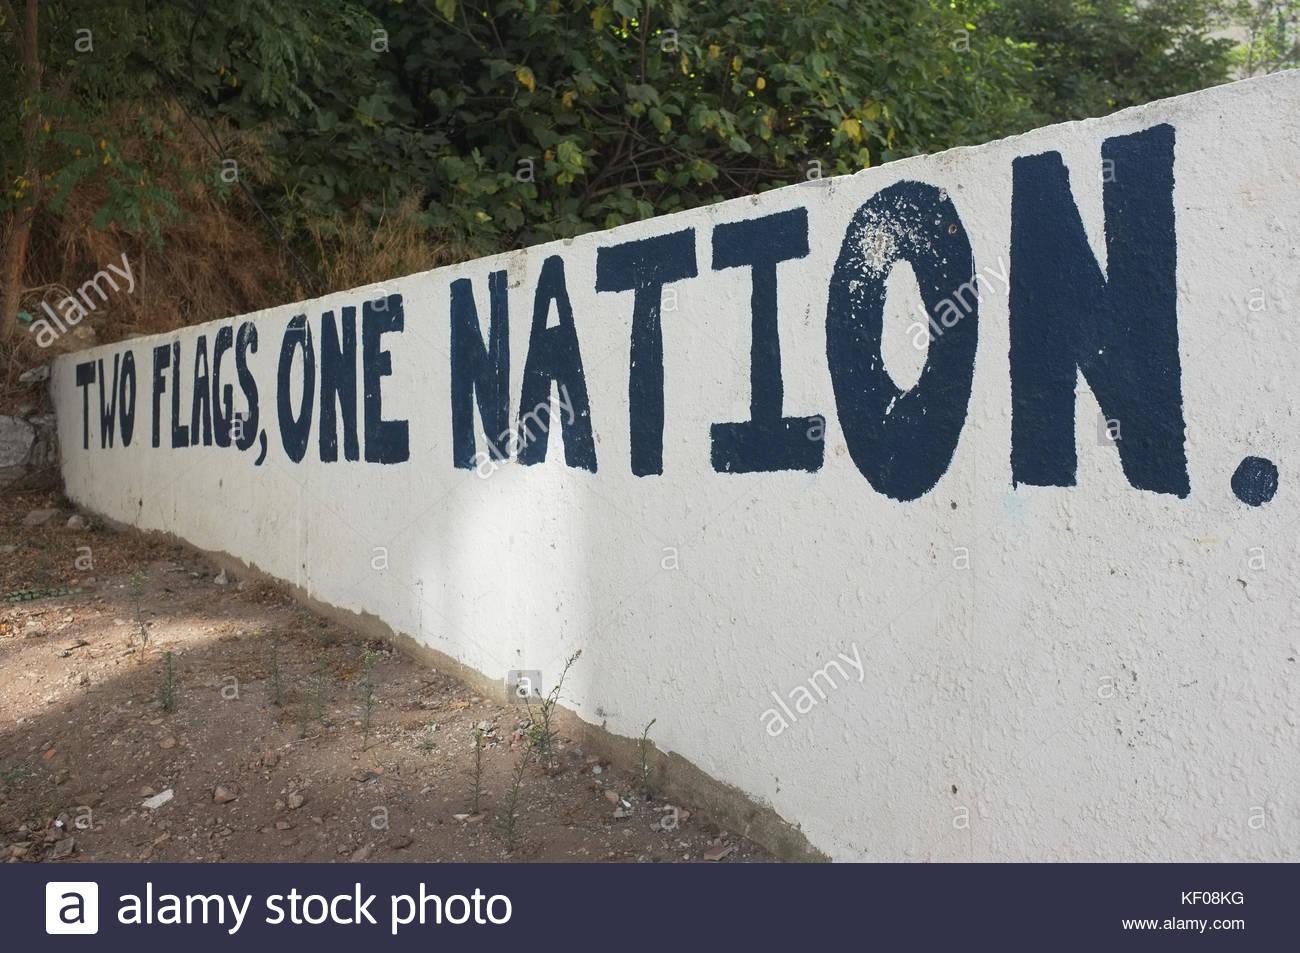 'Two flags, one nation' mural, Gibraltar, September 2017 - Stock Image